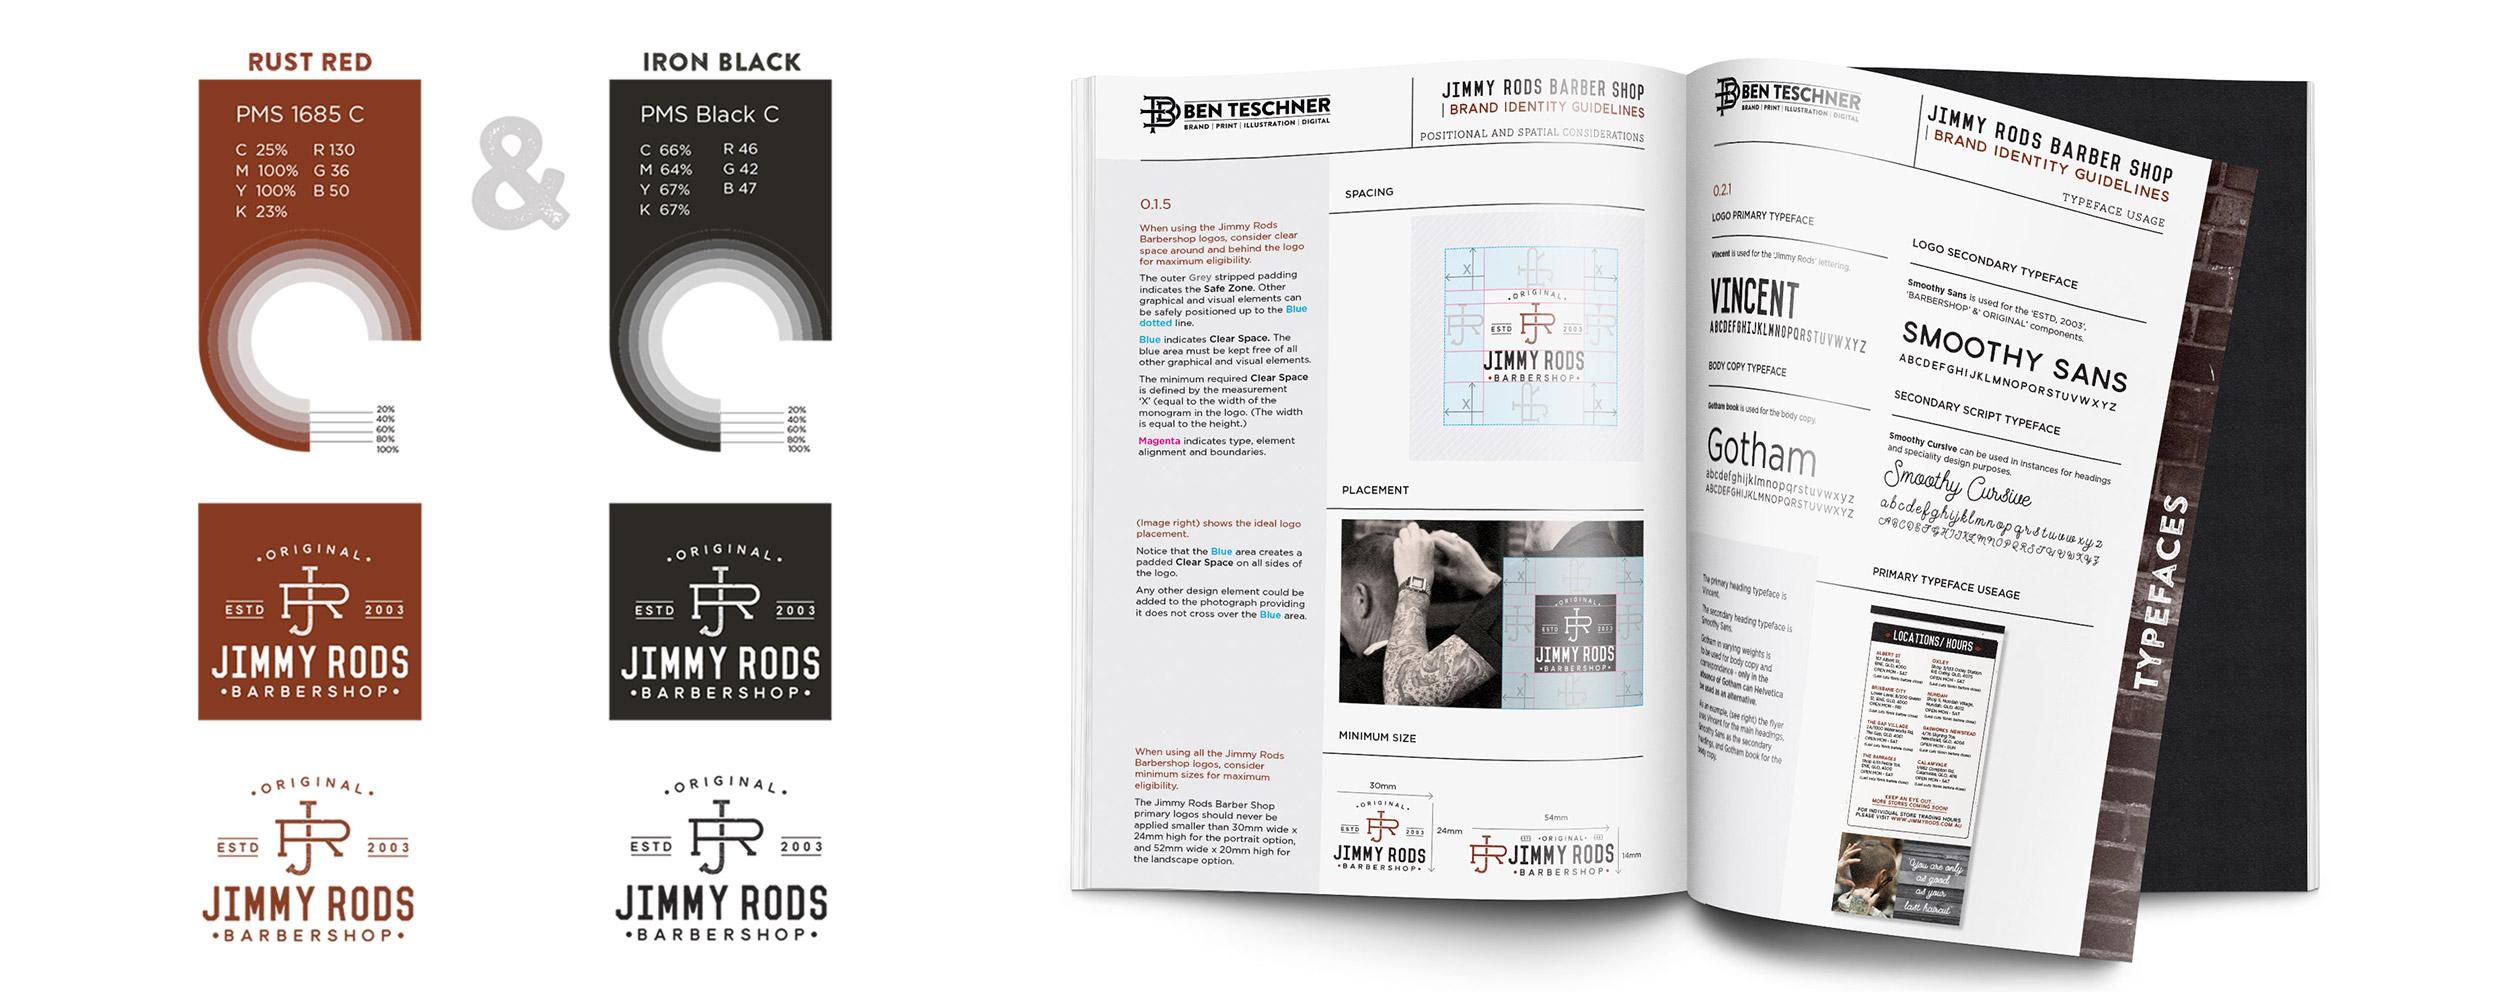 Brand Identity Booklet